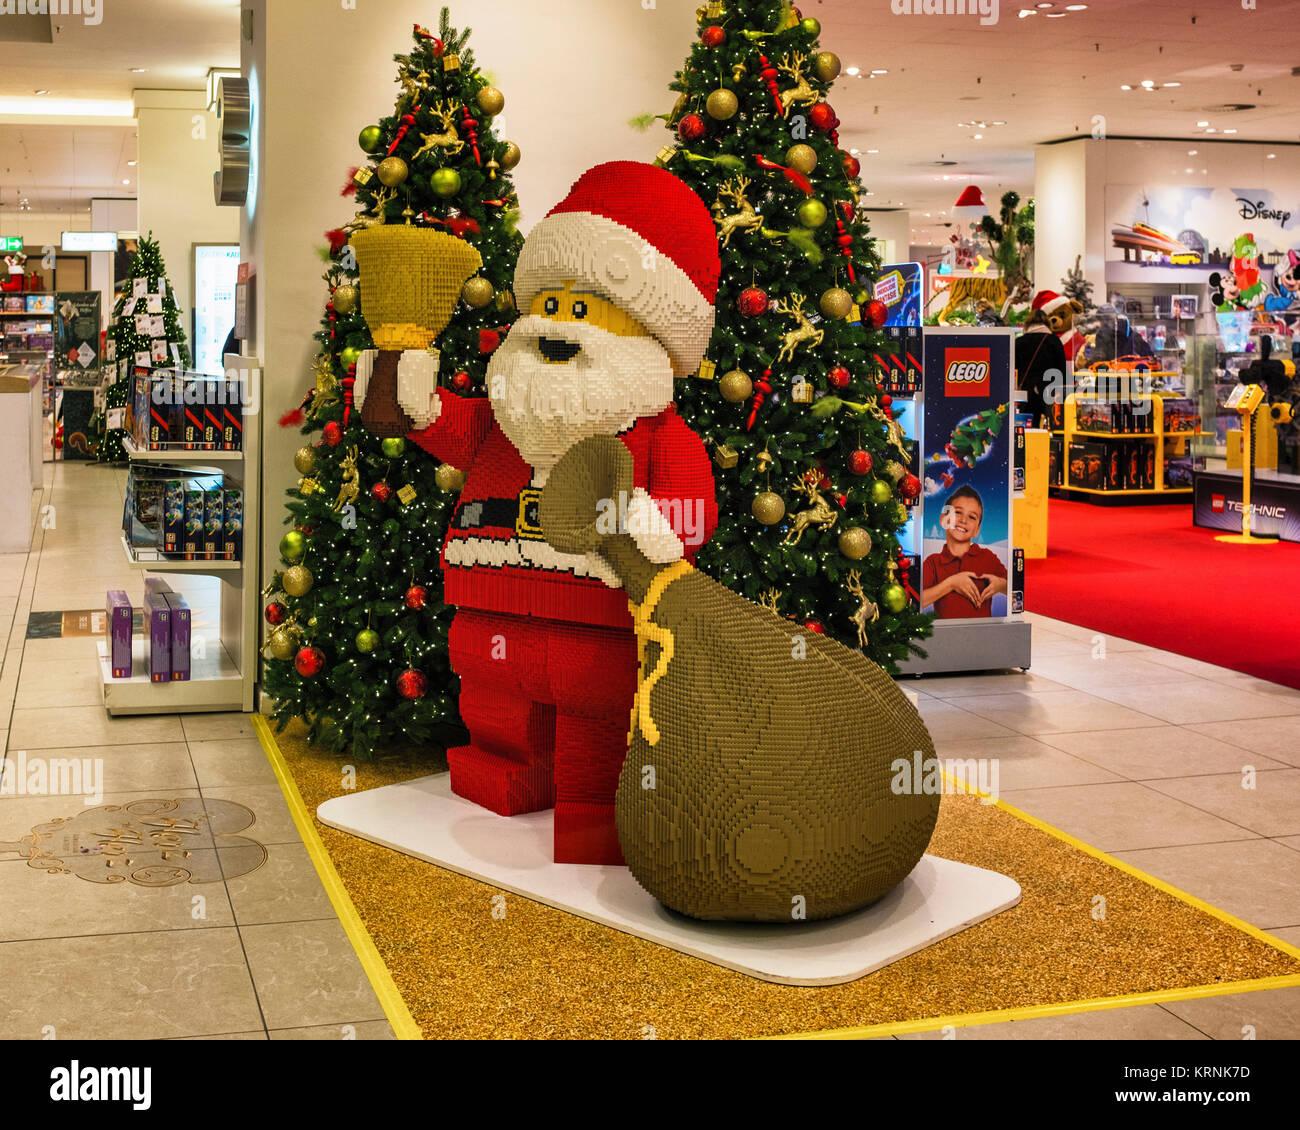 Galeria Kaufhof: Lego Store Stock Photos & Lego Store Stock Images